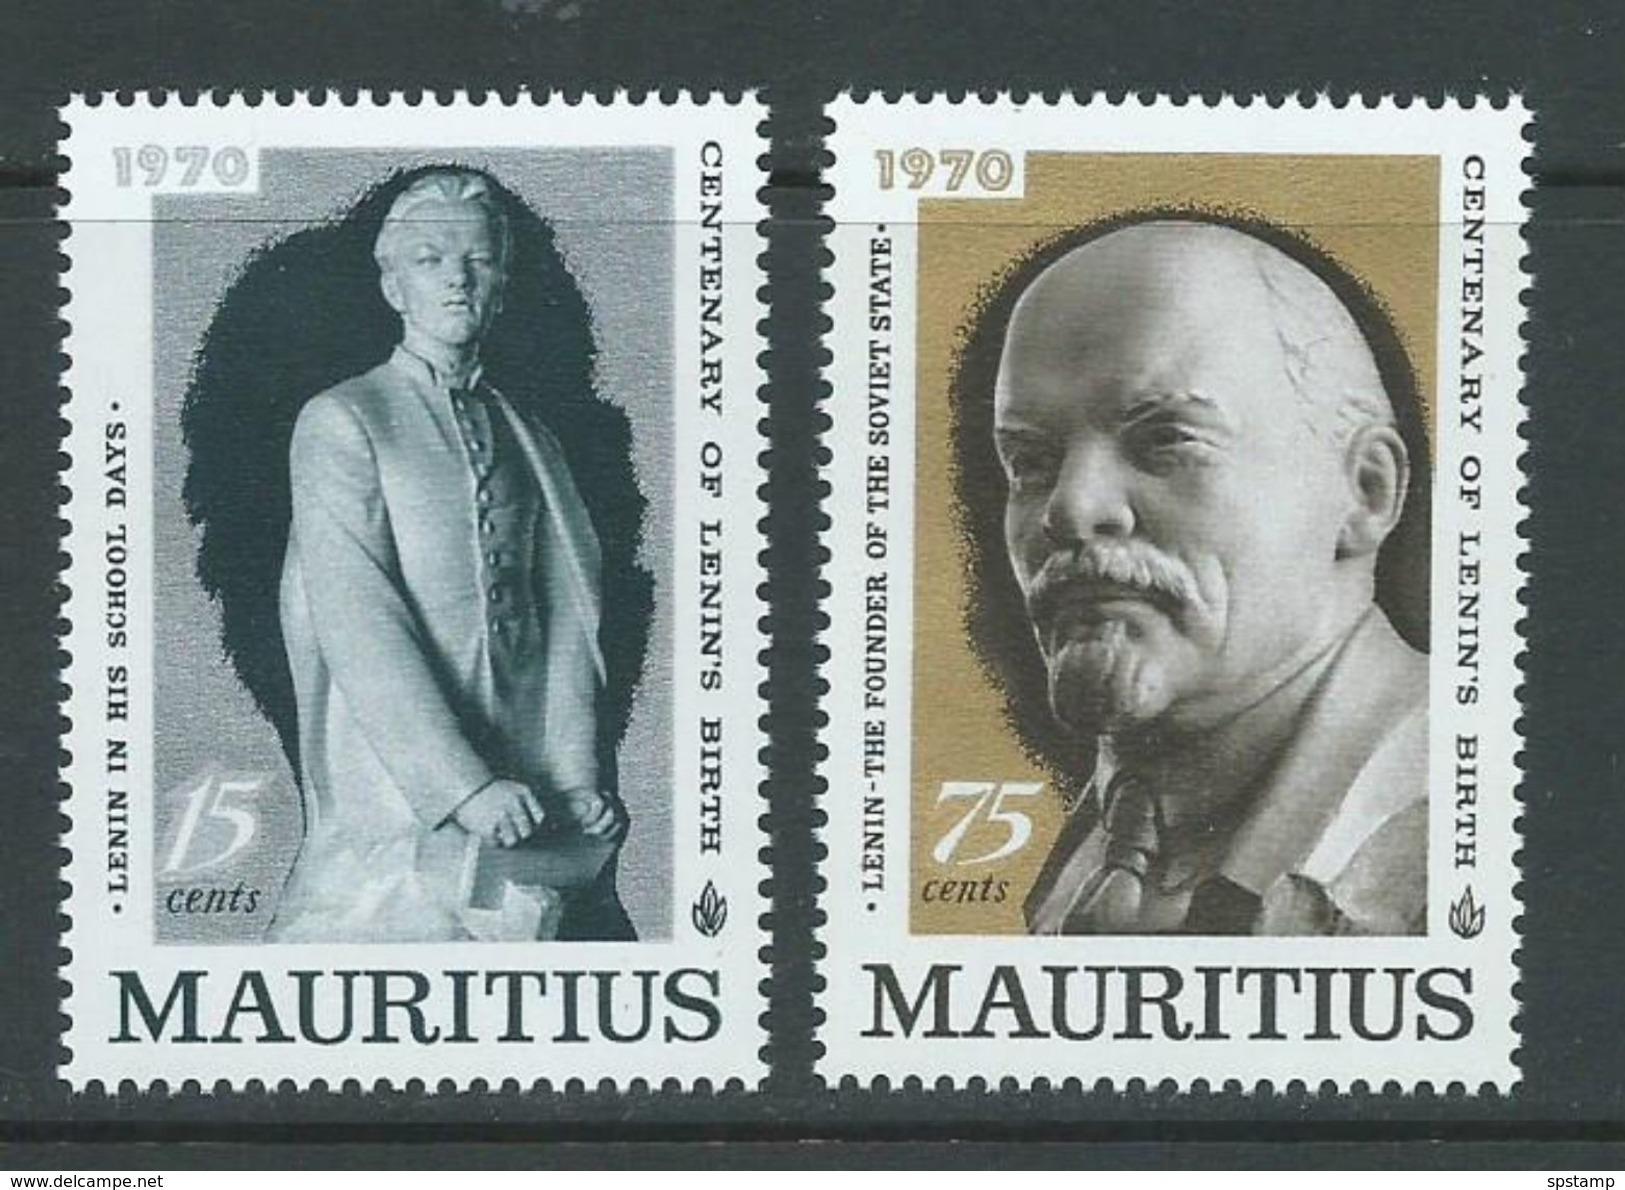 Mauritius 1970 Lenin Anniversary Set Of 2 MNH - Mauritius (1968-...)